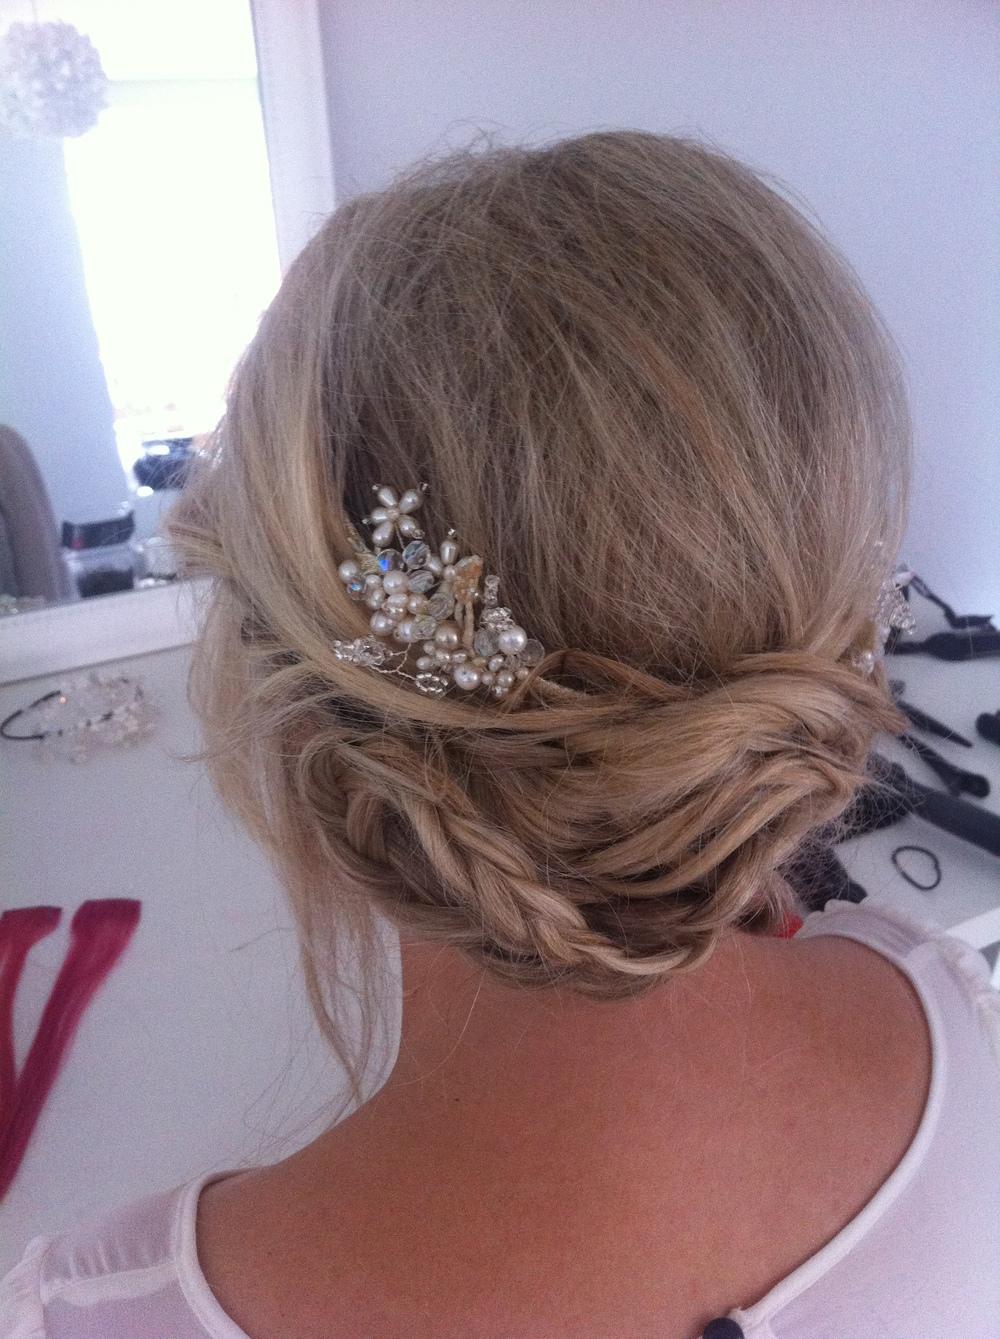 Boho/Festival chic style hair